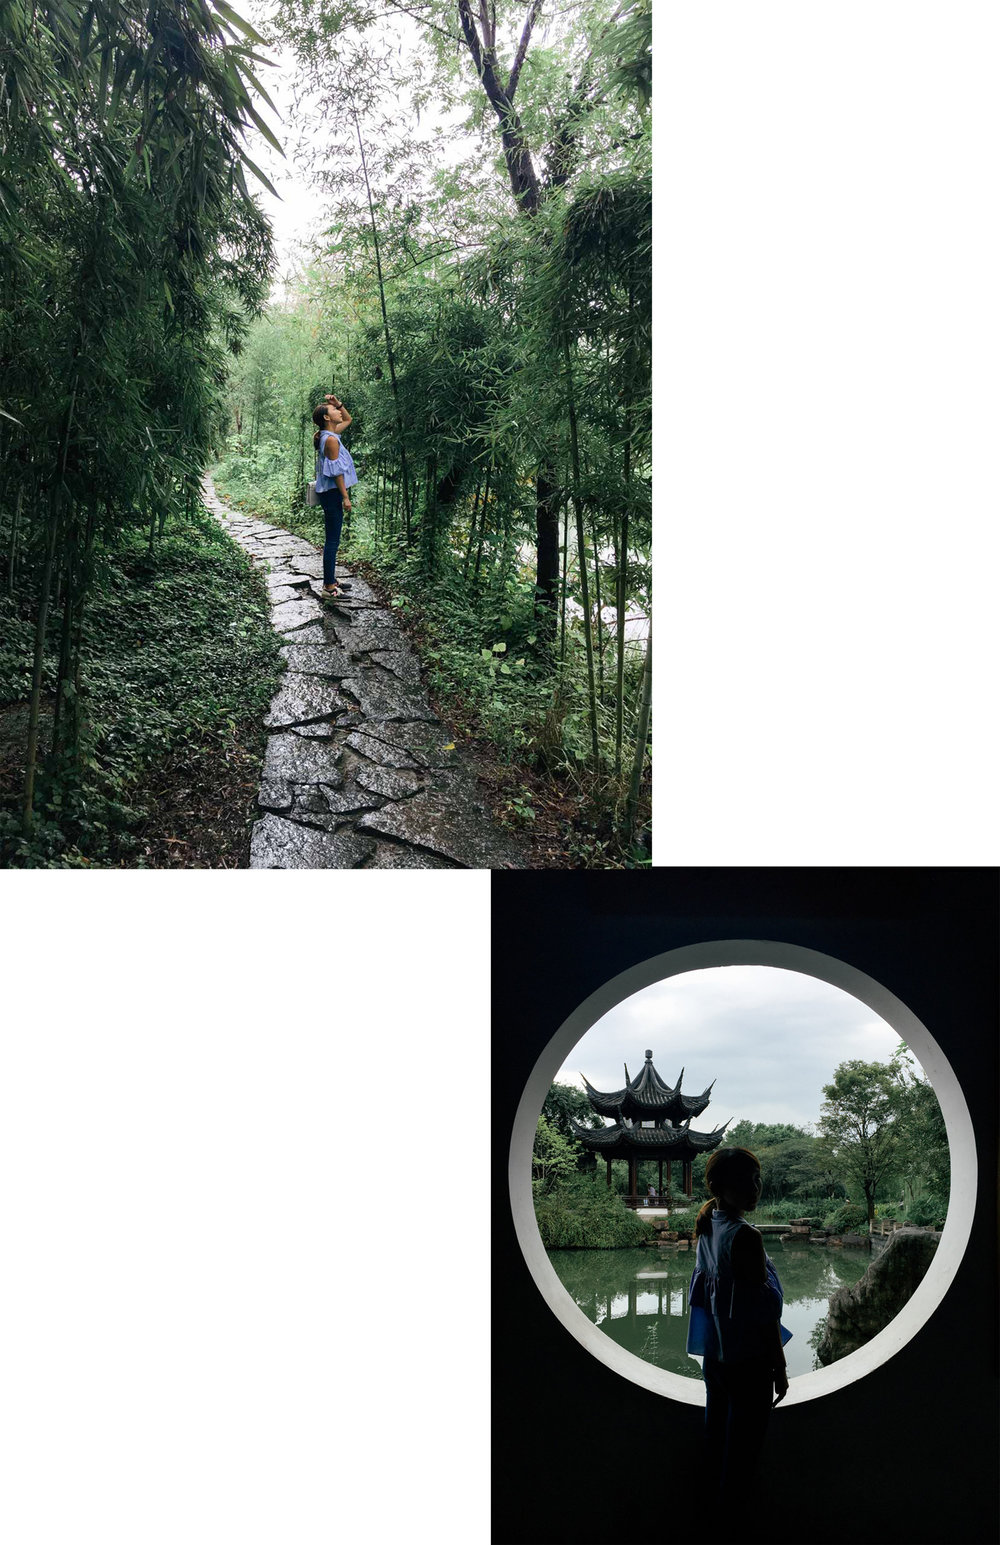 hangzhou-xixi-wetland-lesycomore